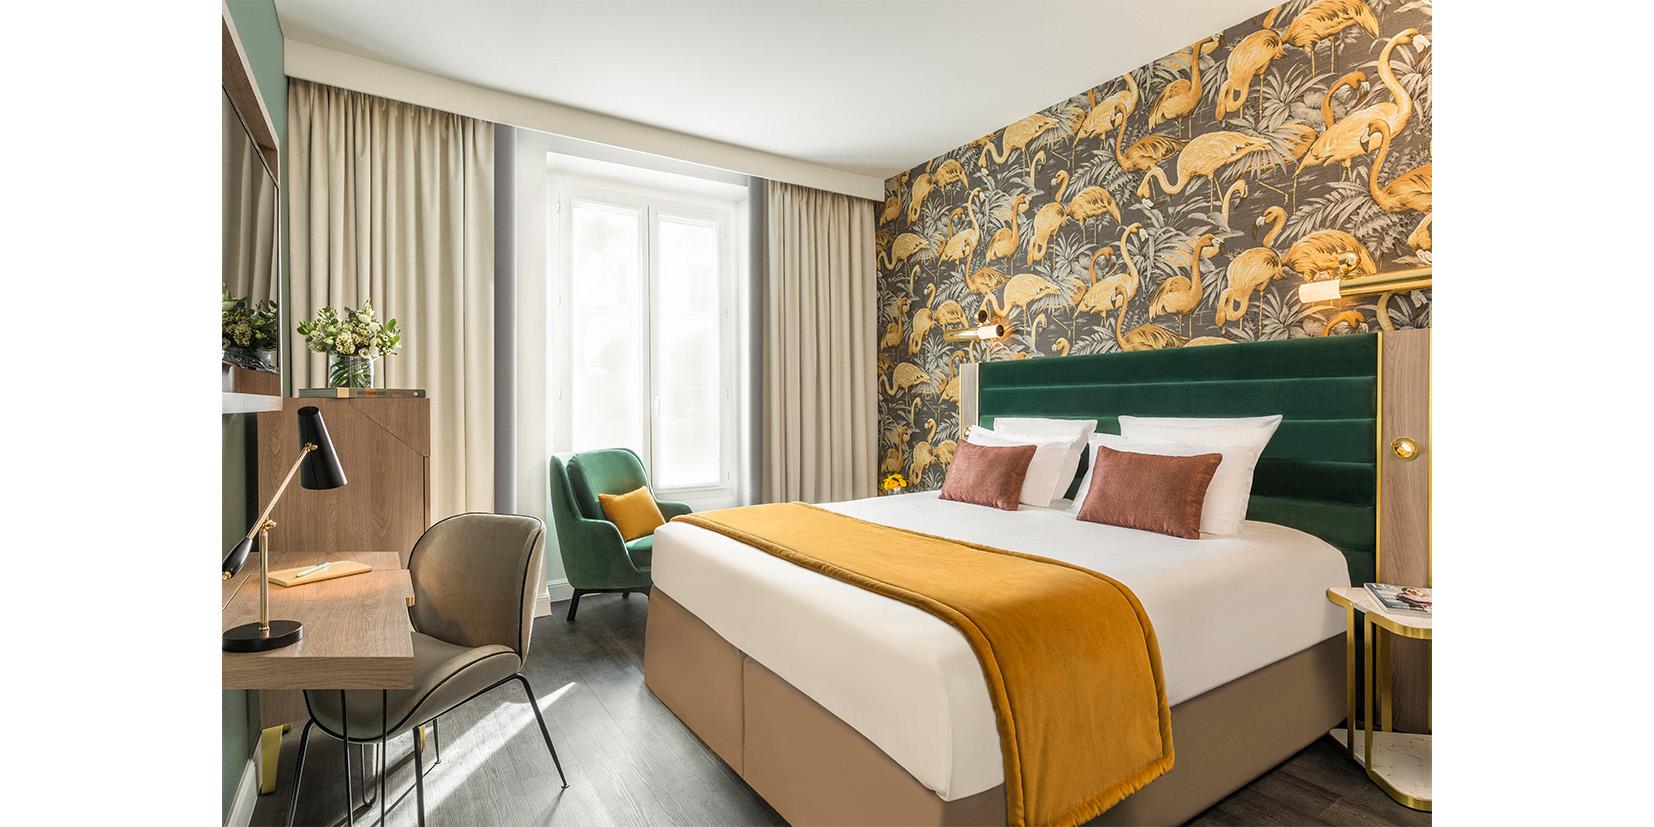 Opal Hotel - Paris - 2018